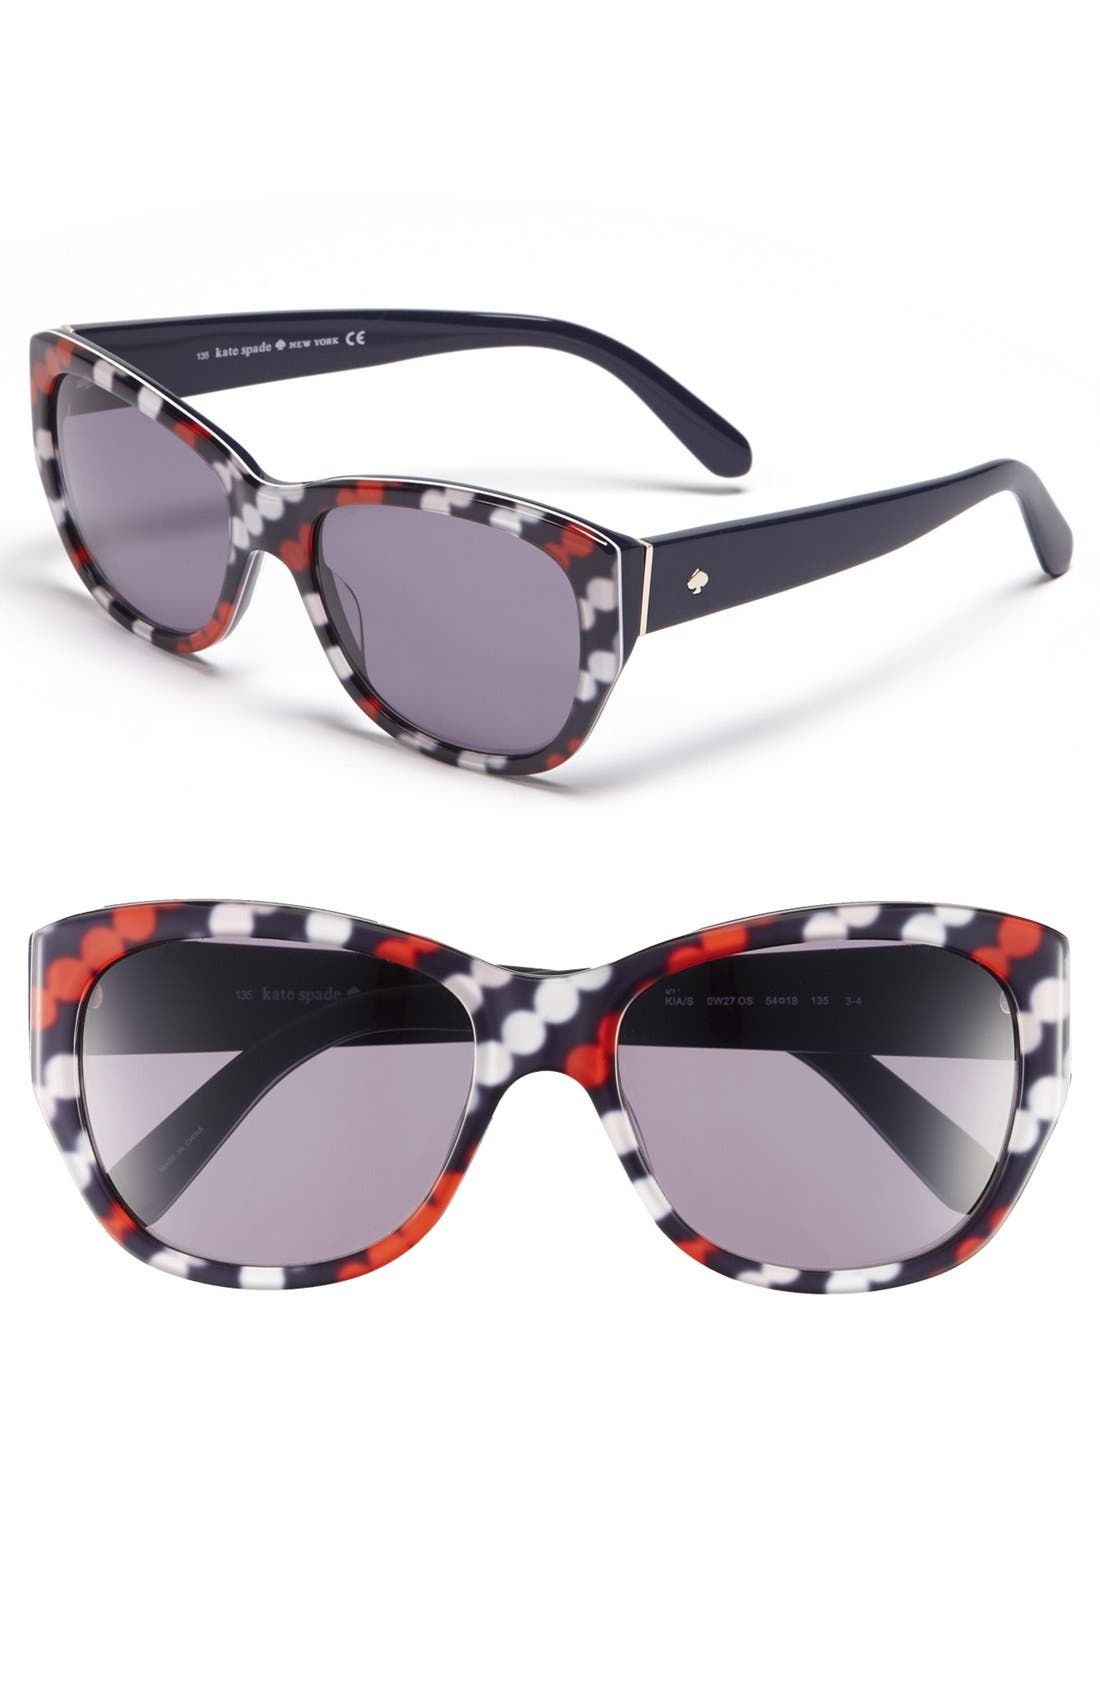 Main Image - kate spade new york 'kia' 54mm cat eye sunglasses